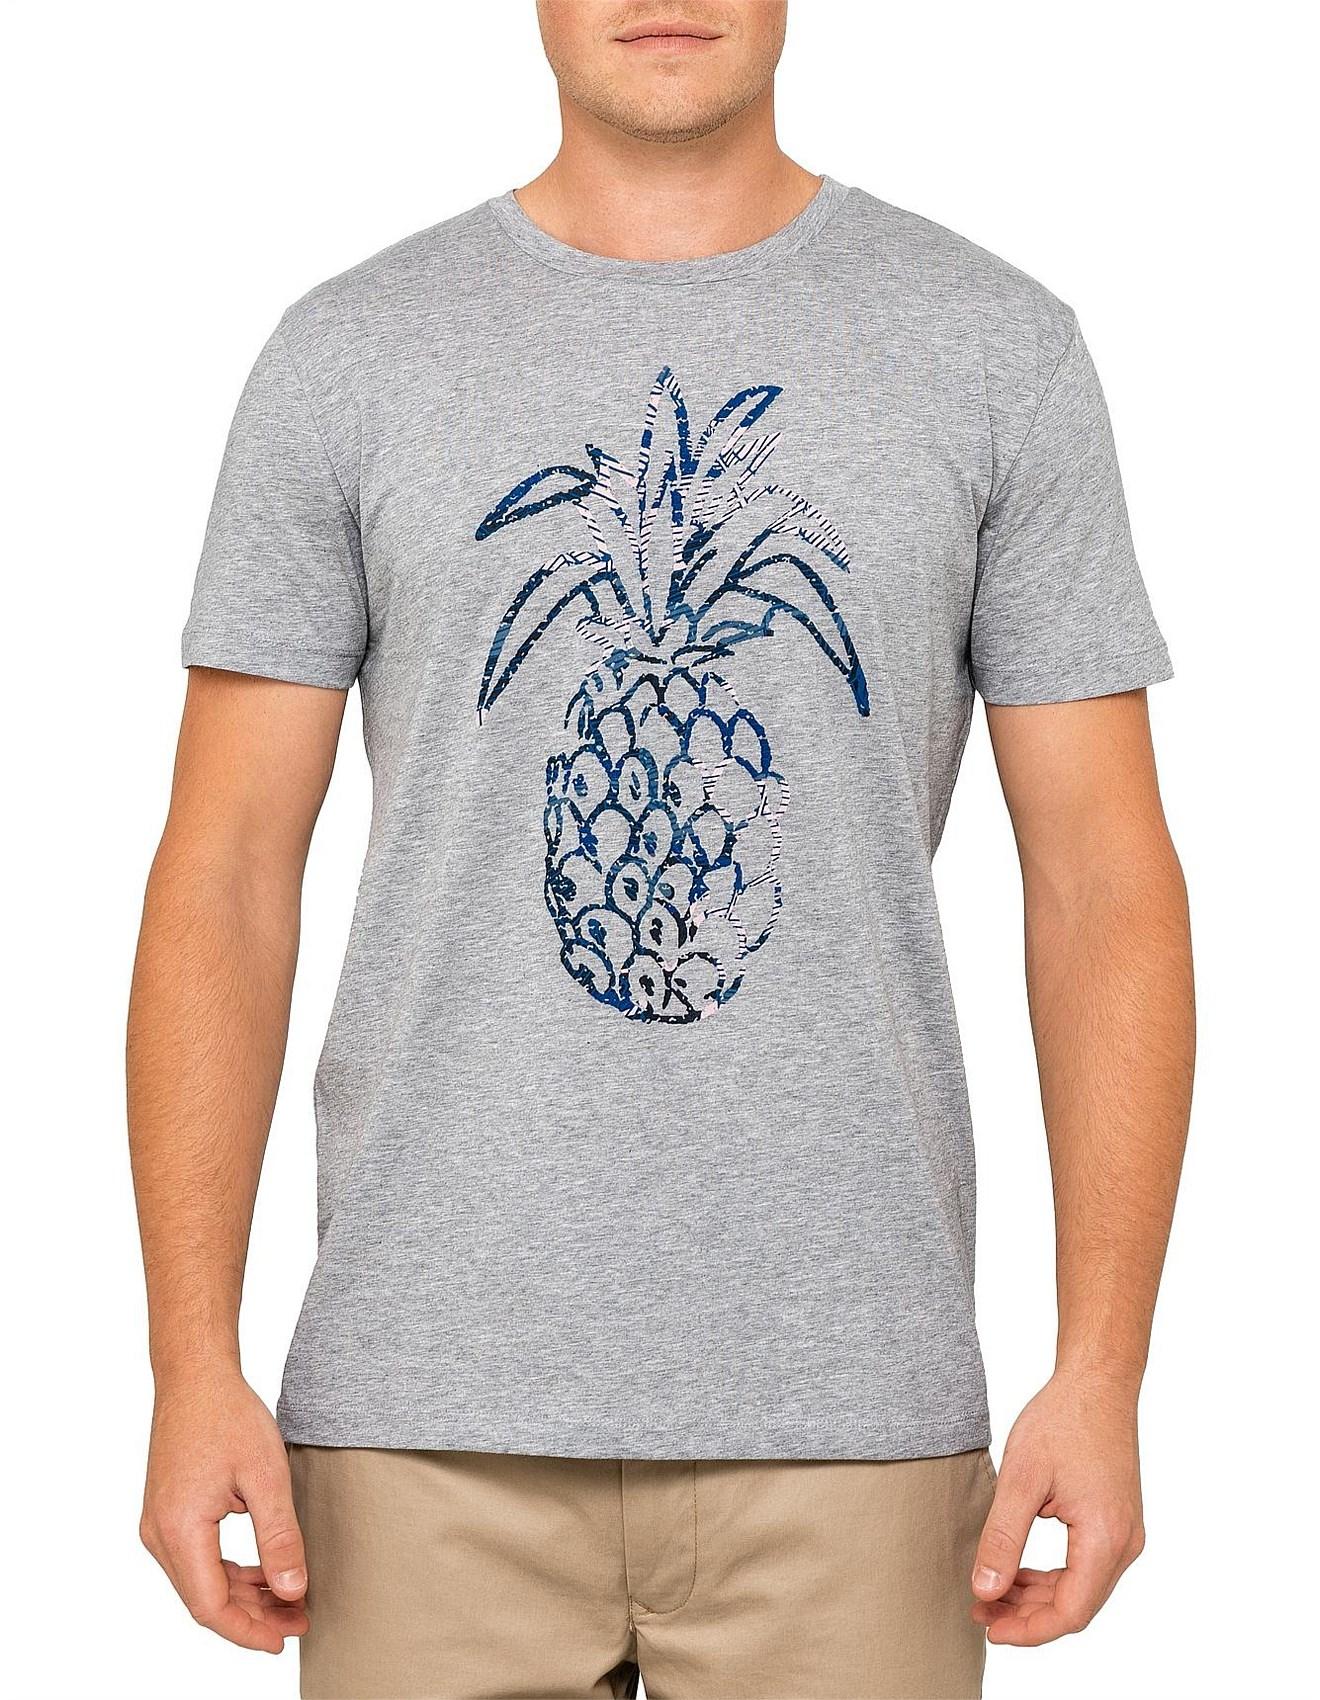 ff939a688cb Tauno 1 pineapple print tee